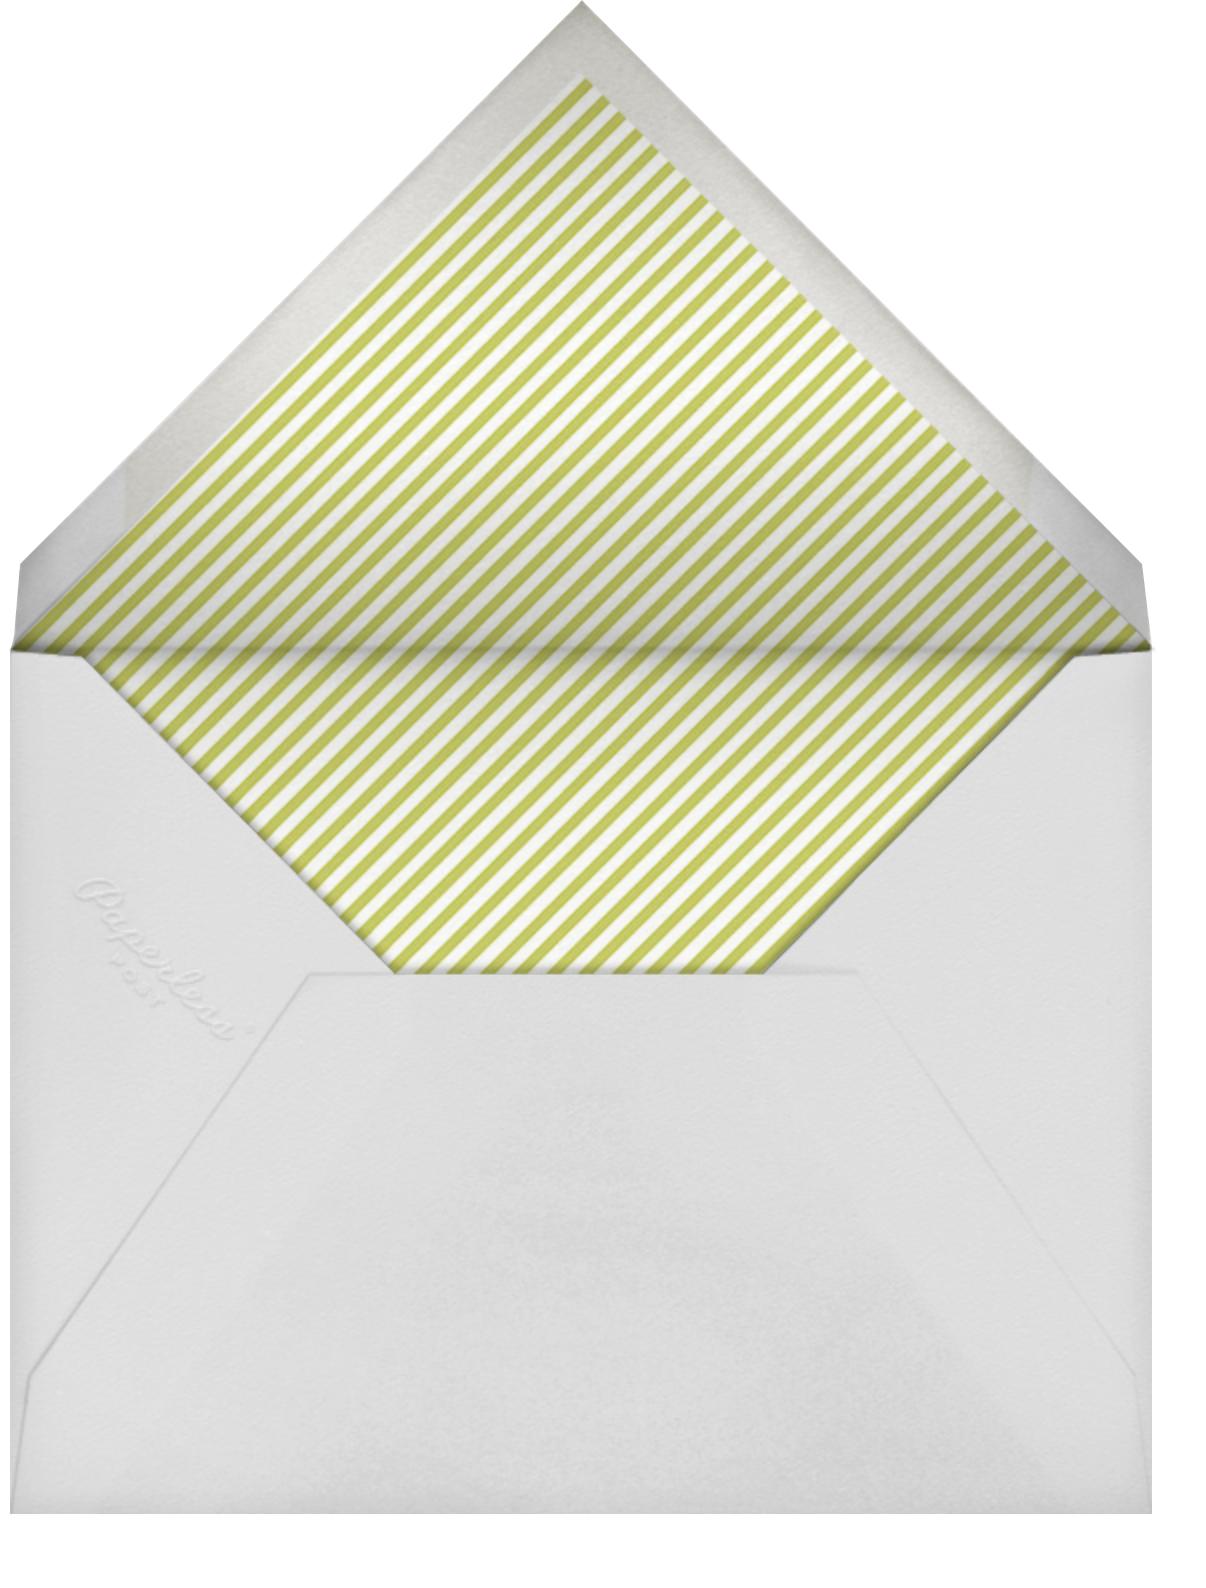 Mini Berlin - Old Kyoto Mix - Mr. Boddington's Studio - Adult birthday - envelope back